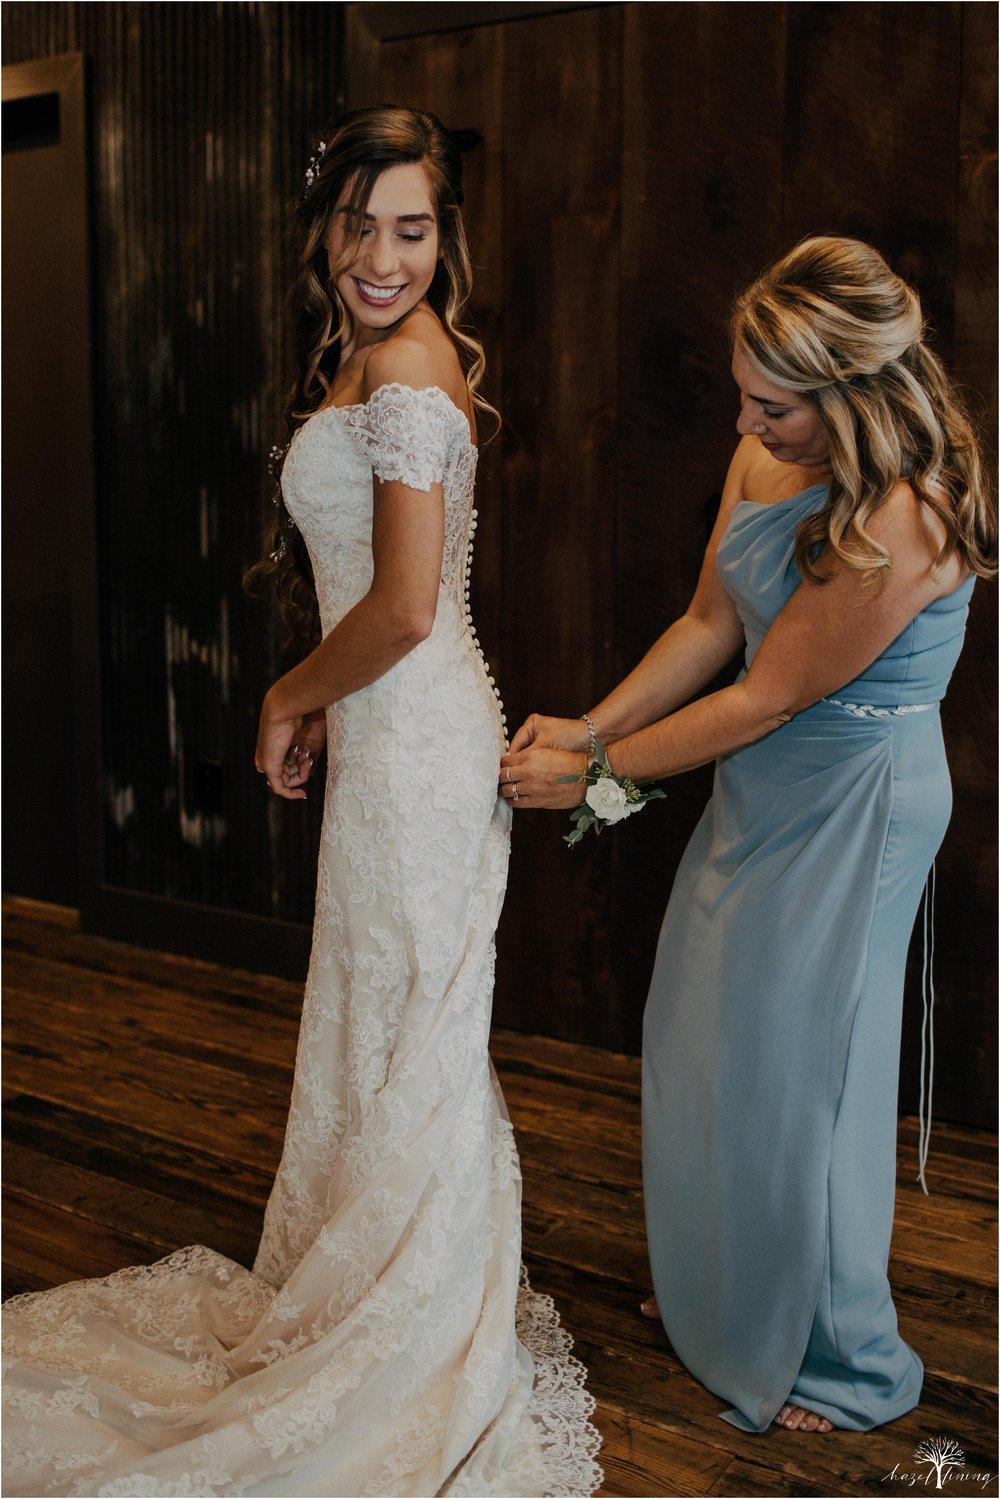 emma-matt-gehringer-the-booking-house-lancaster-manhiem-pennsylvania-winter-wedding_0015.jpg